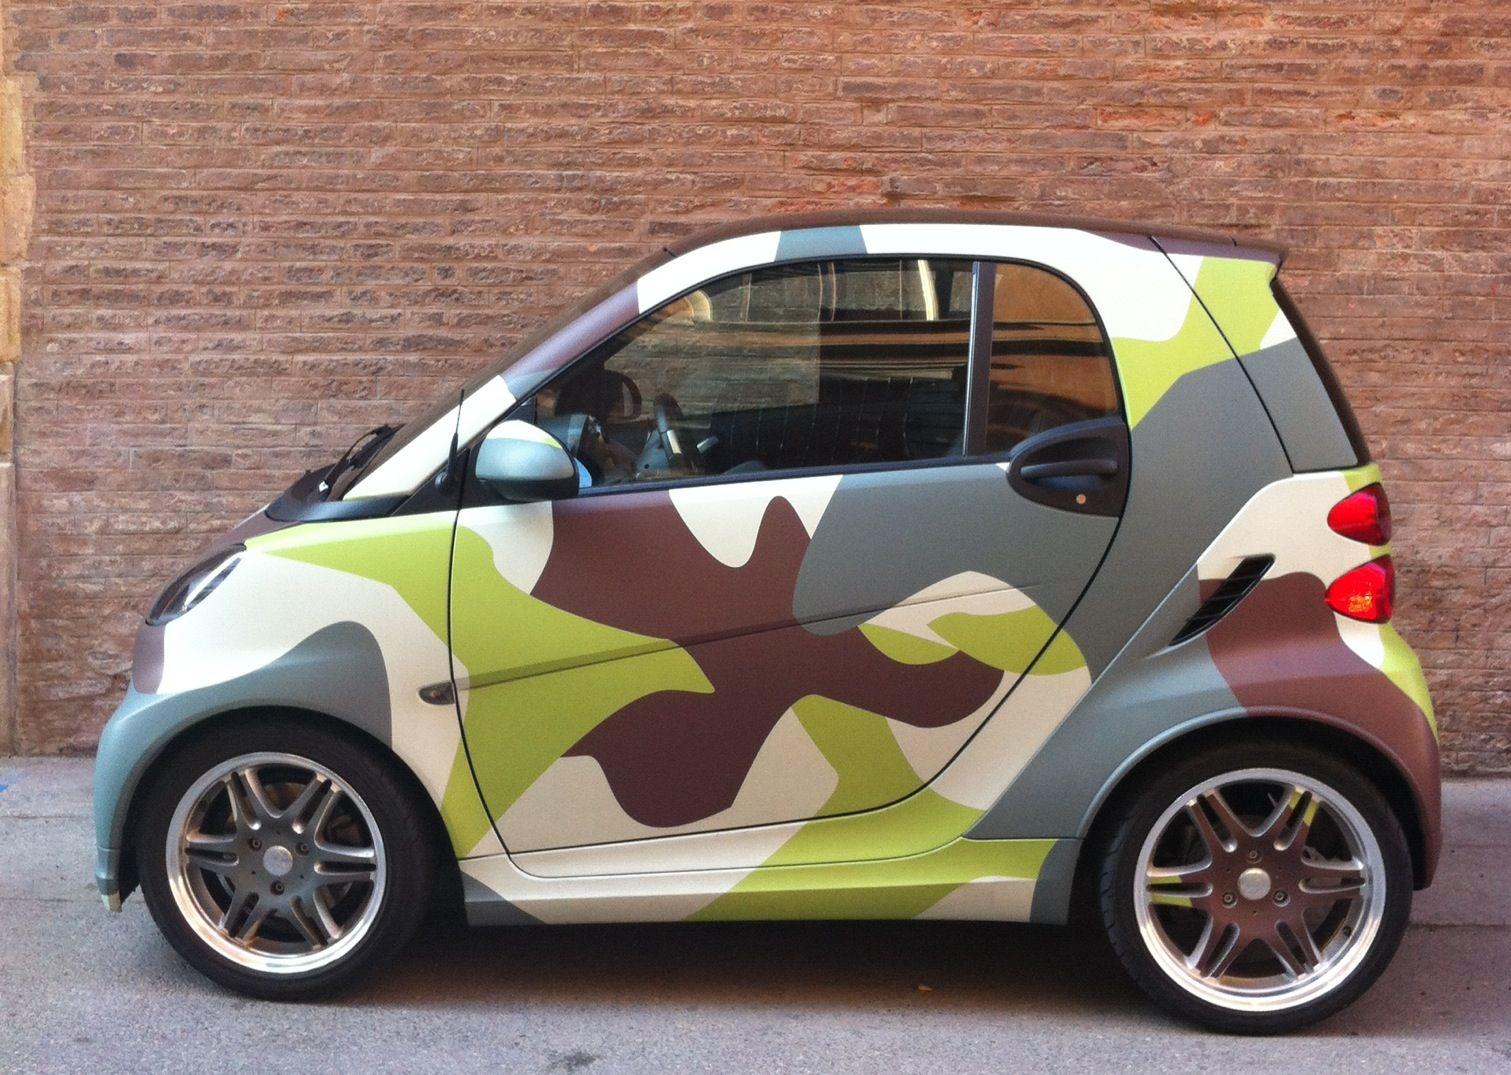 smart cars Smart fortwo passion - consumerreportsorg.